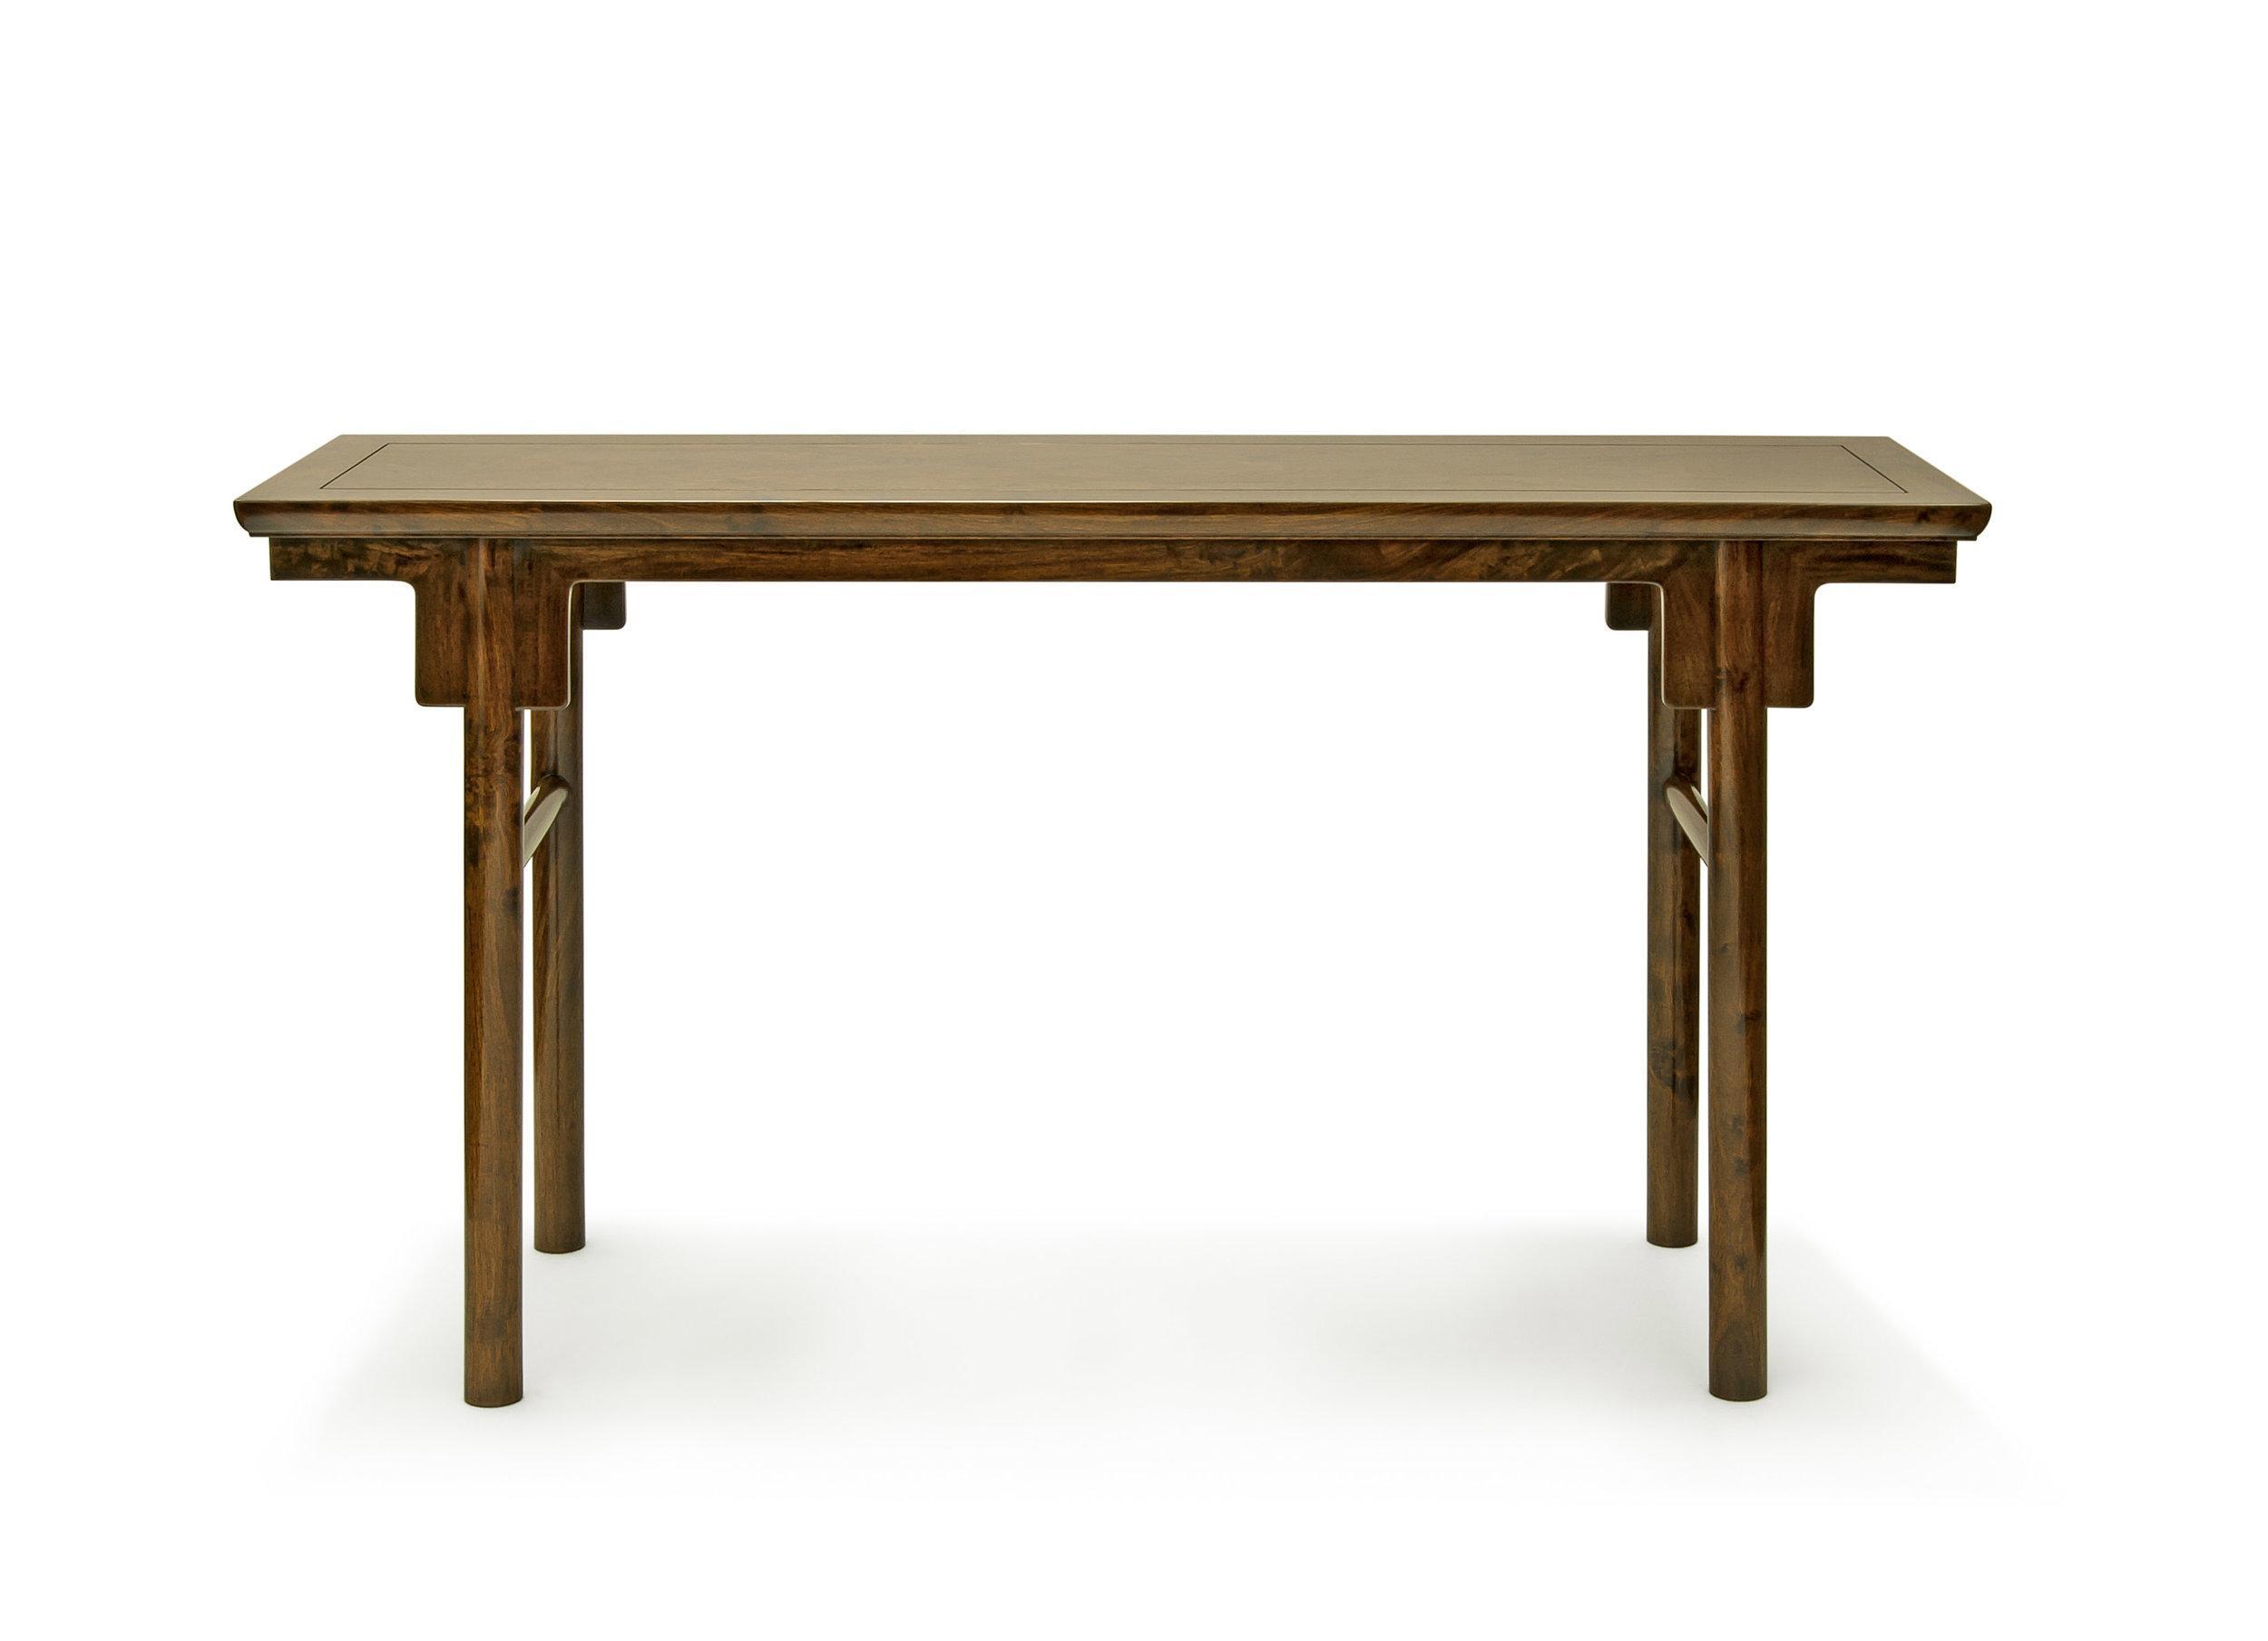 ....bespoke chinese ming style furniture : side table..特别定制中式明式家具 : 条桌....